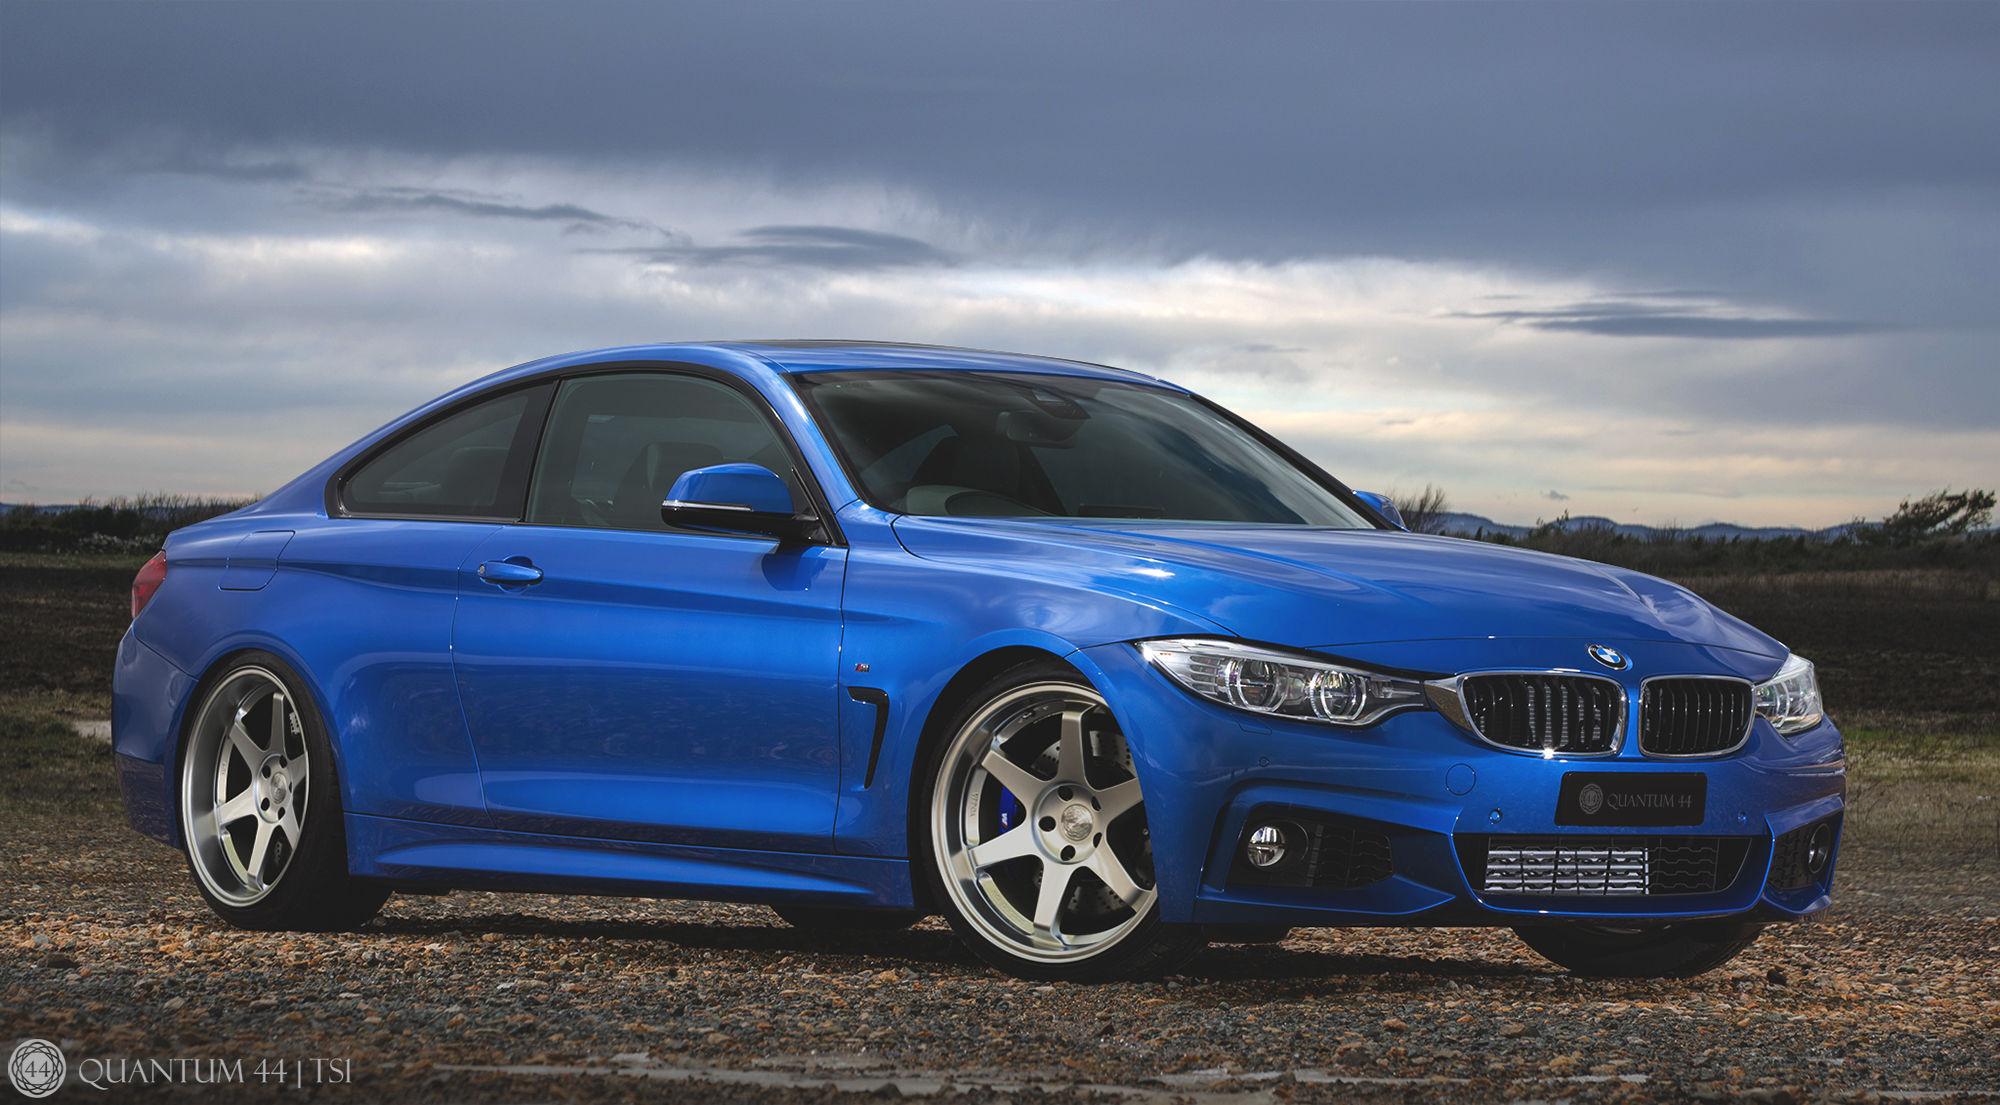 BMW 4 Series   Quantum44 TS1 - BMW 435i M sport